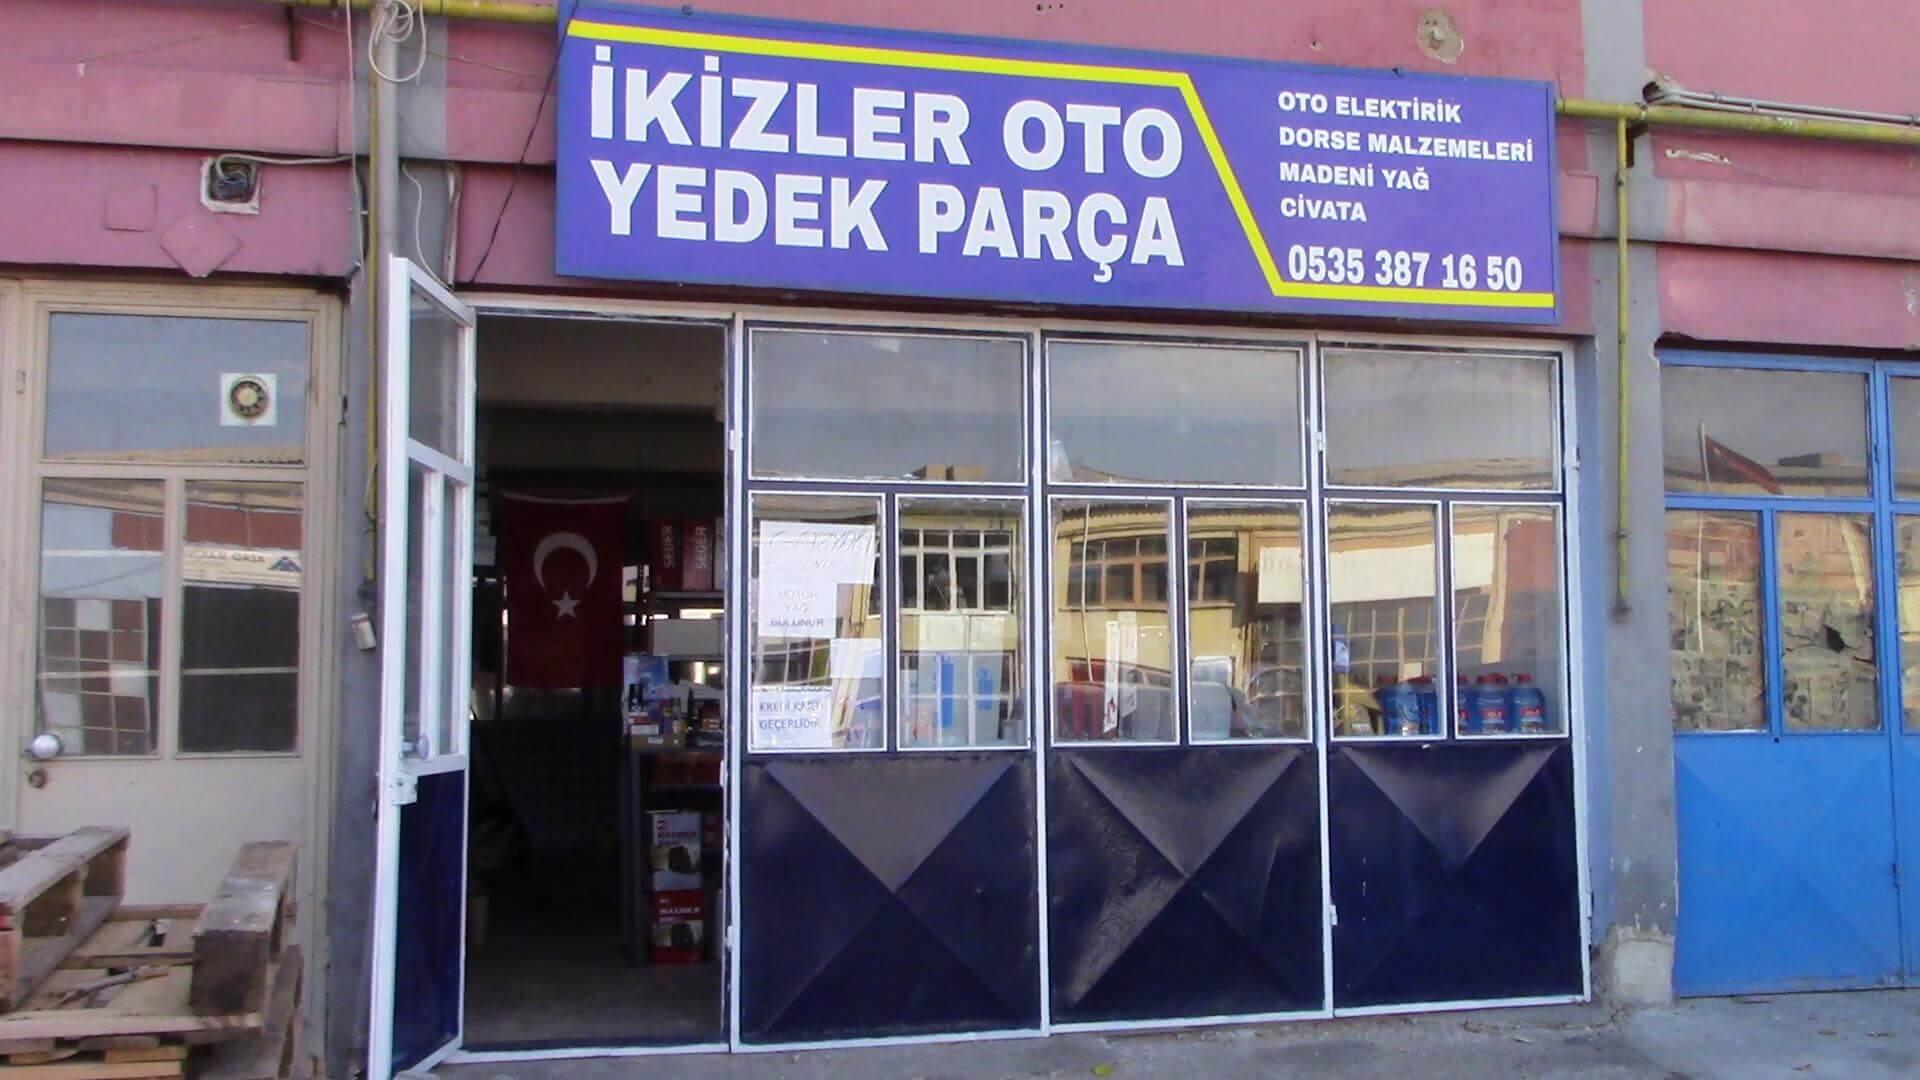 Eskişehir İkizler Oto - Eskişehir Oto Yedek Parça | Eskişehir Oto